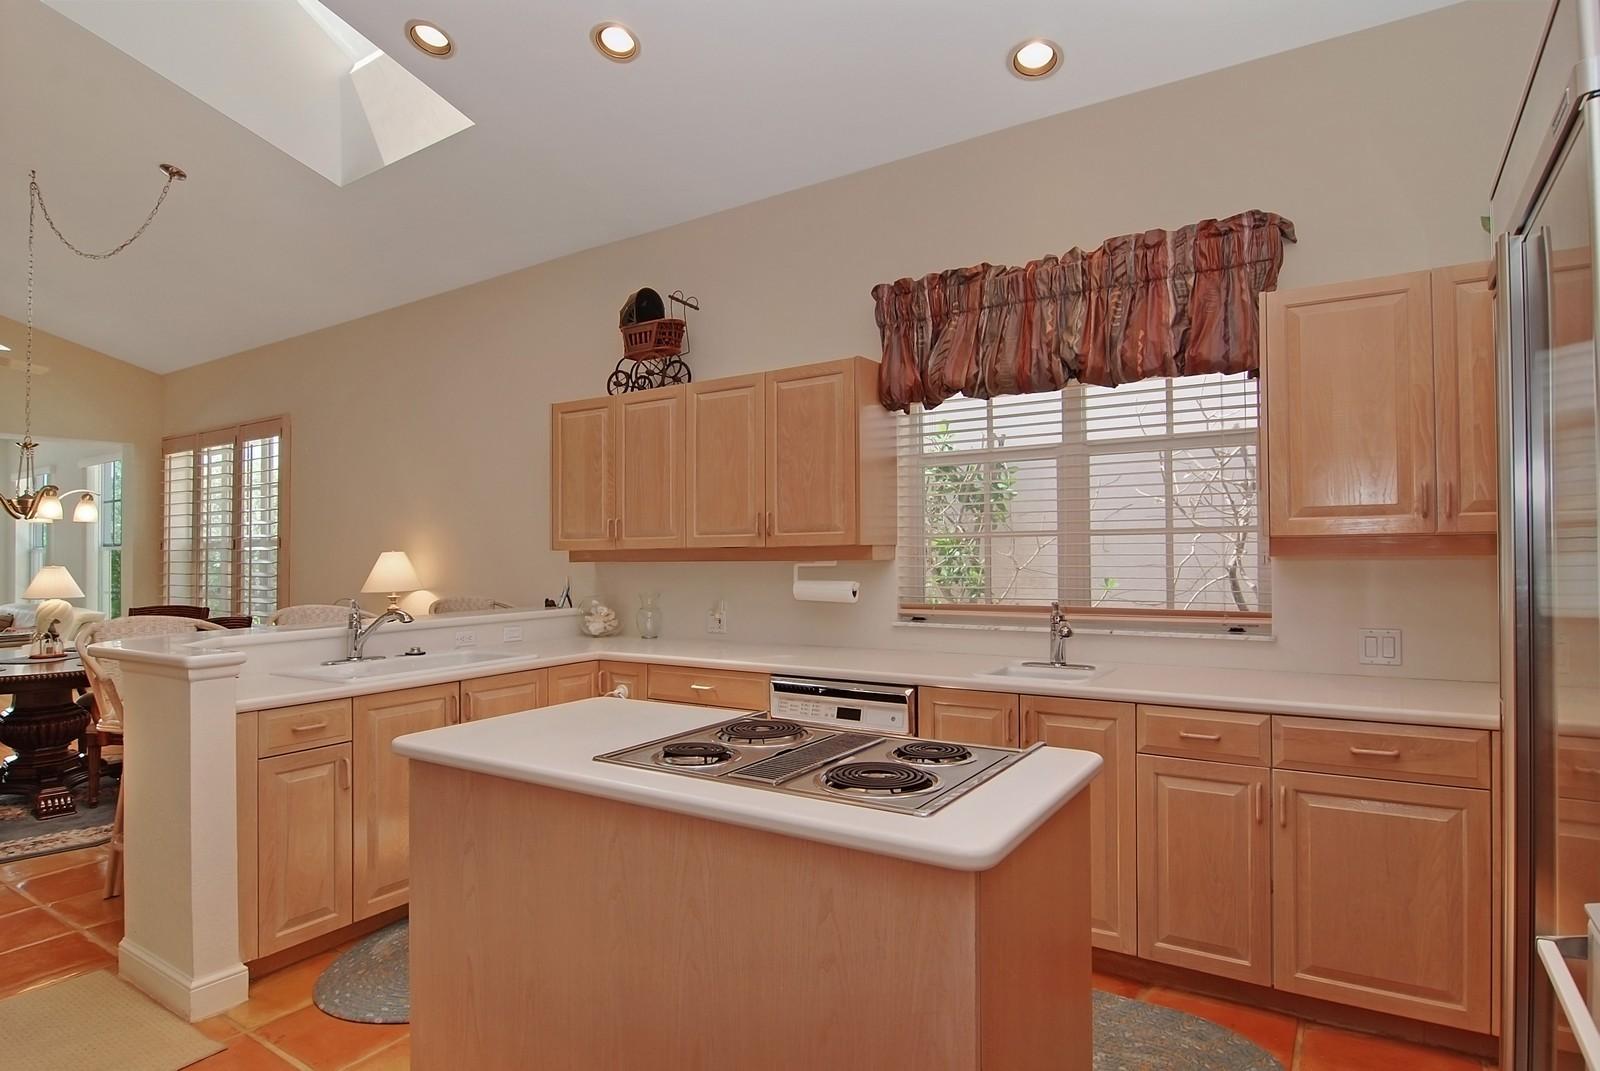 Real Estate Photography - 7000 SE Lakeview, Stuart, FL, 34996 - Kitchen